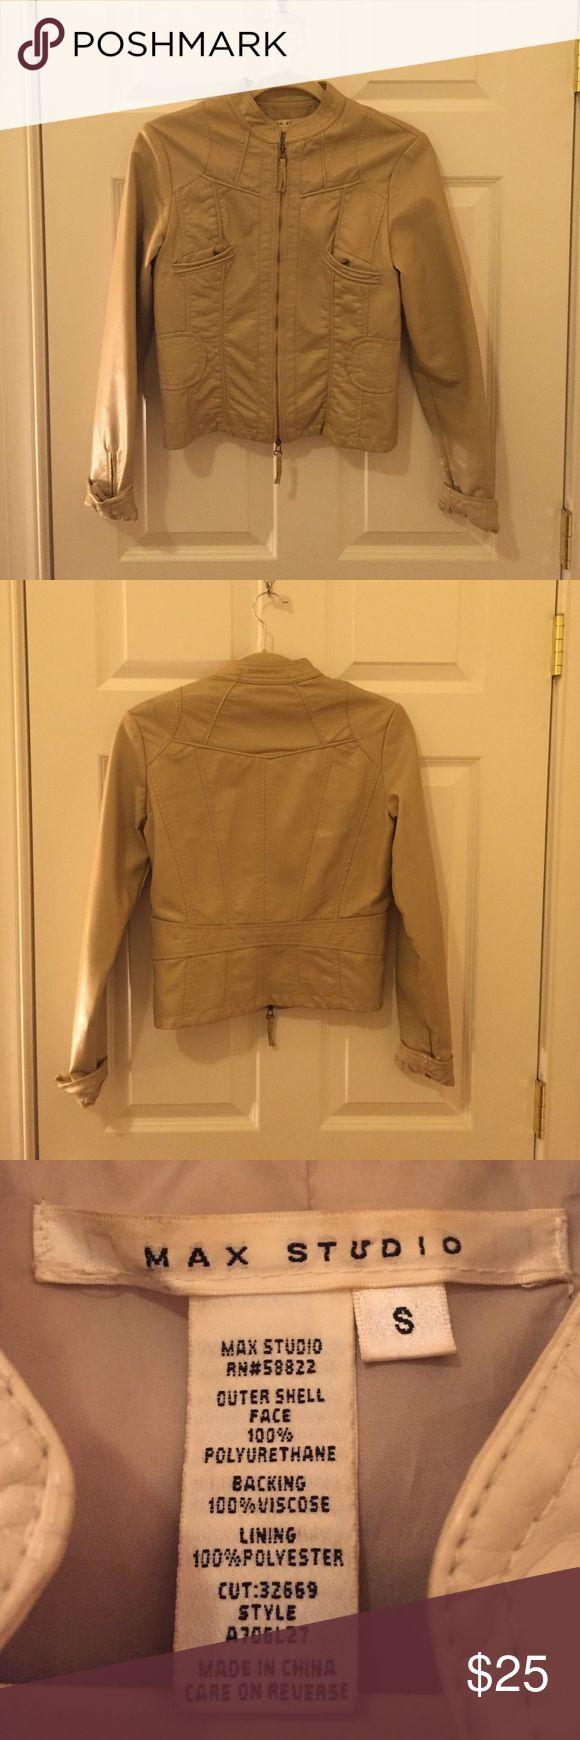 Tan leather jacket Max Studio tan faux leather jacket Max Studio Jackets & Coats